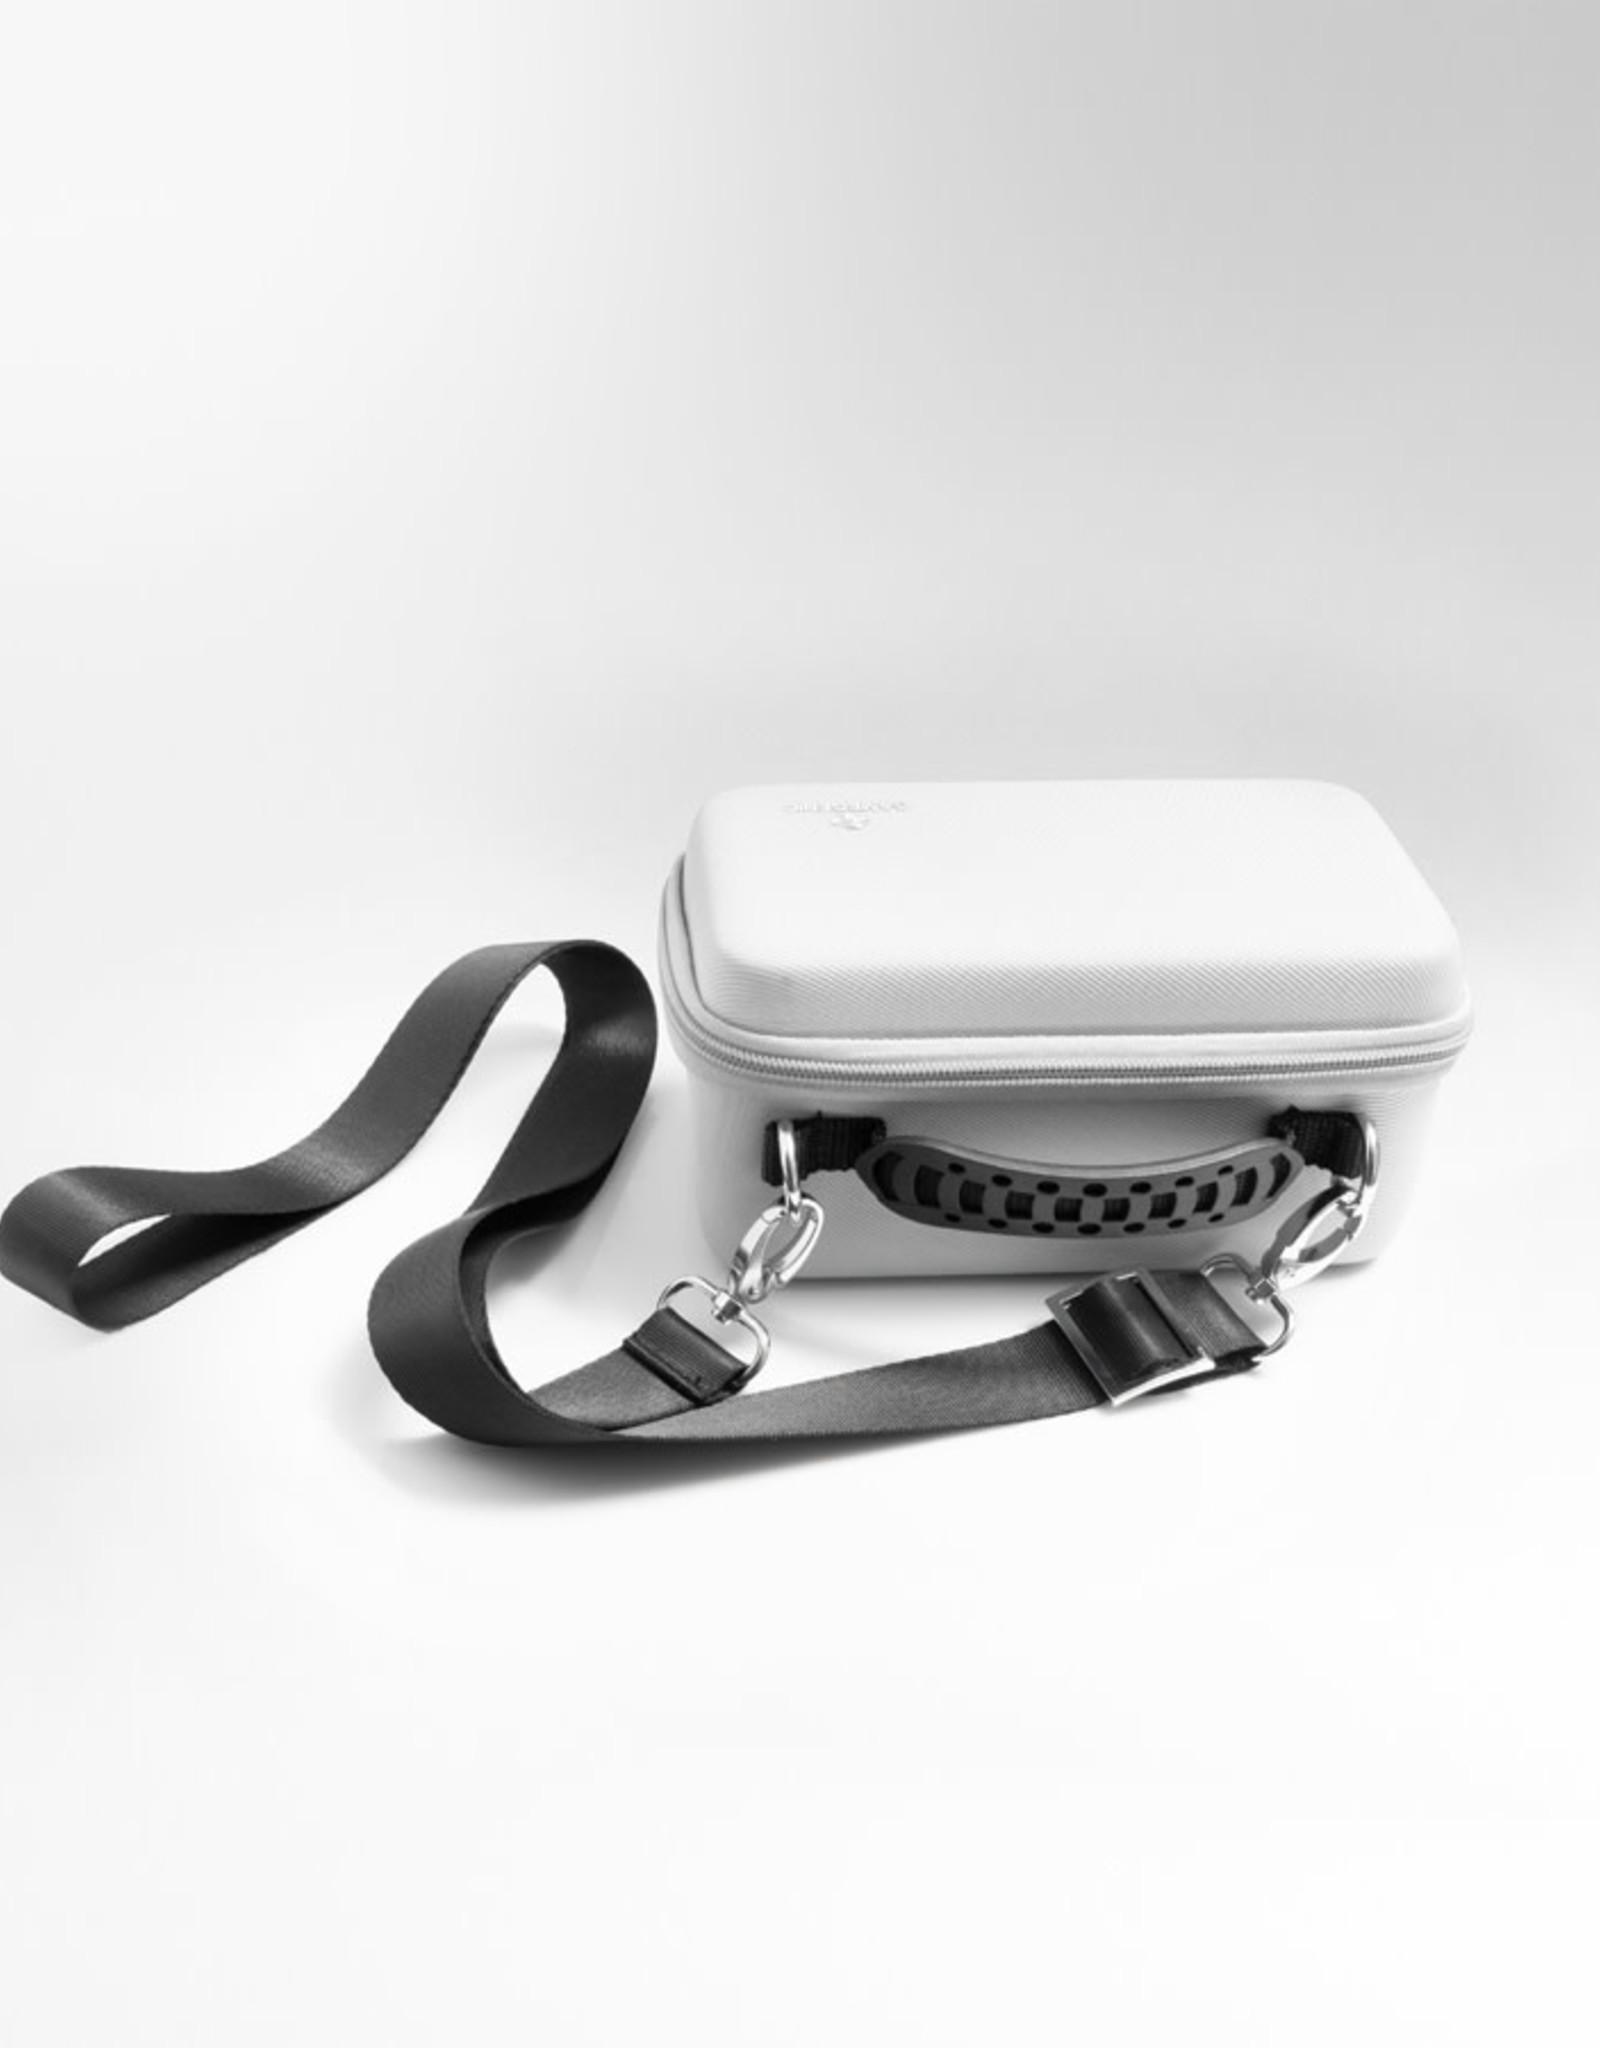 Deck Box: Game Shell 250+ White